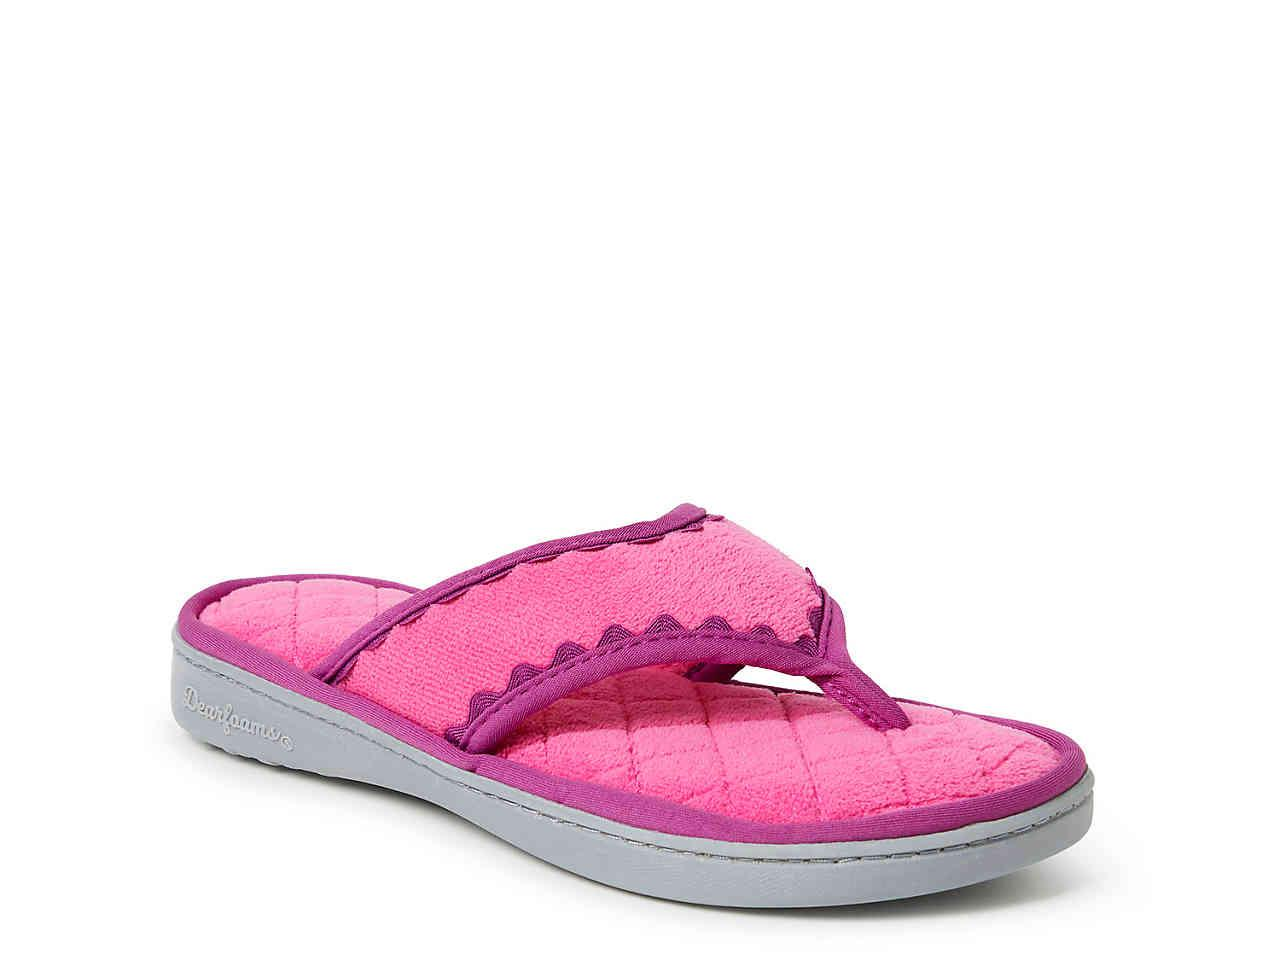 ac47bd37015 Lyst - Dearfoams Terry Thong Slipper in Pink